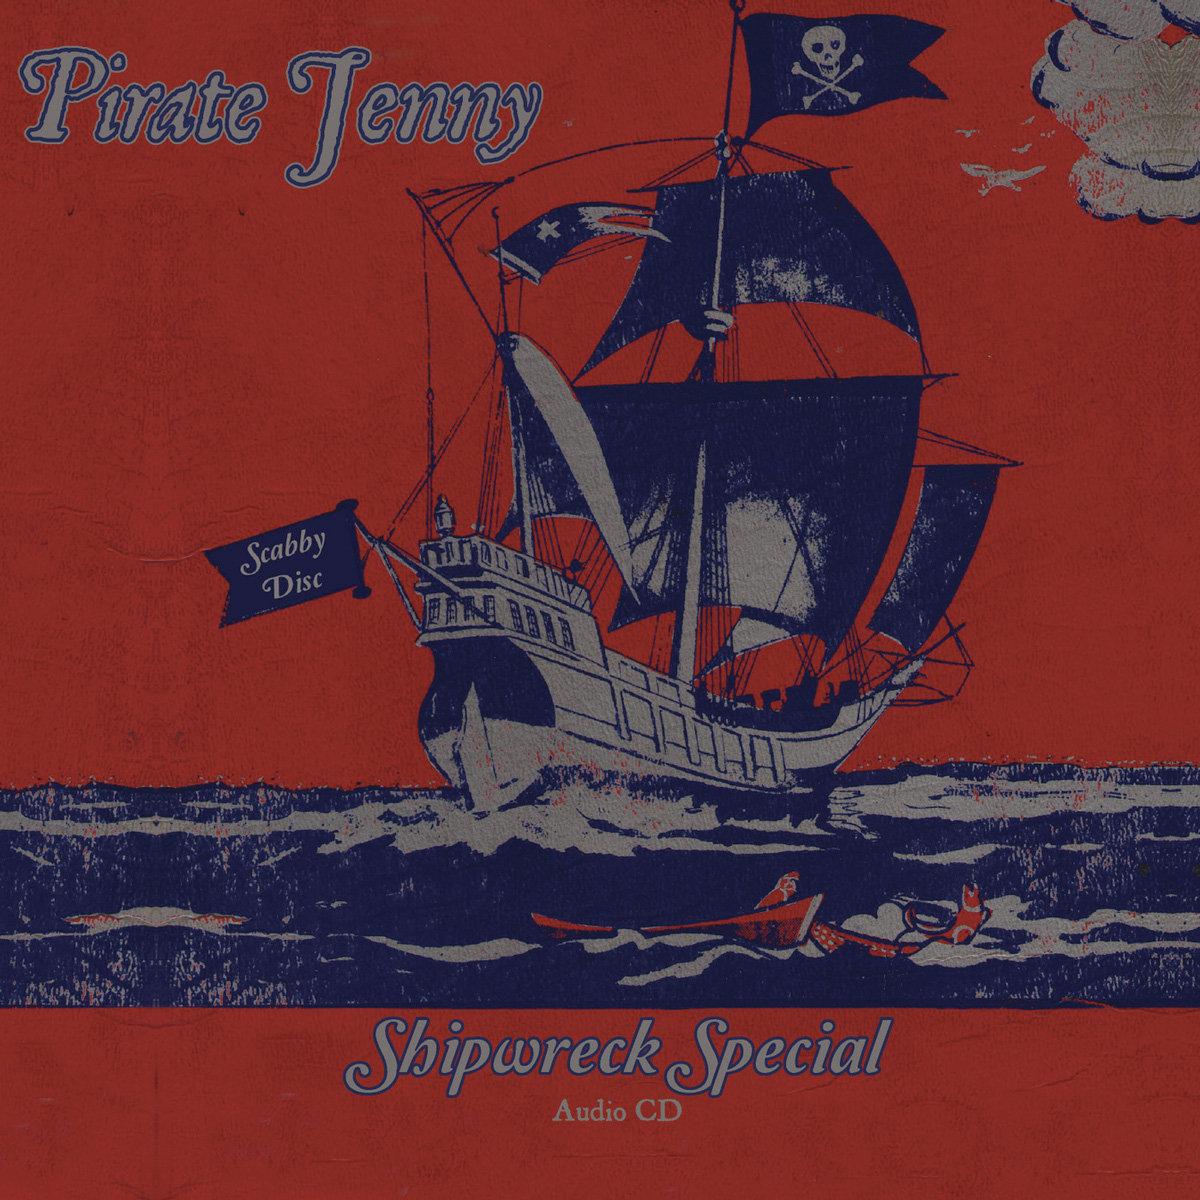 Pirate Jenny Shipwreck Special CD